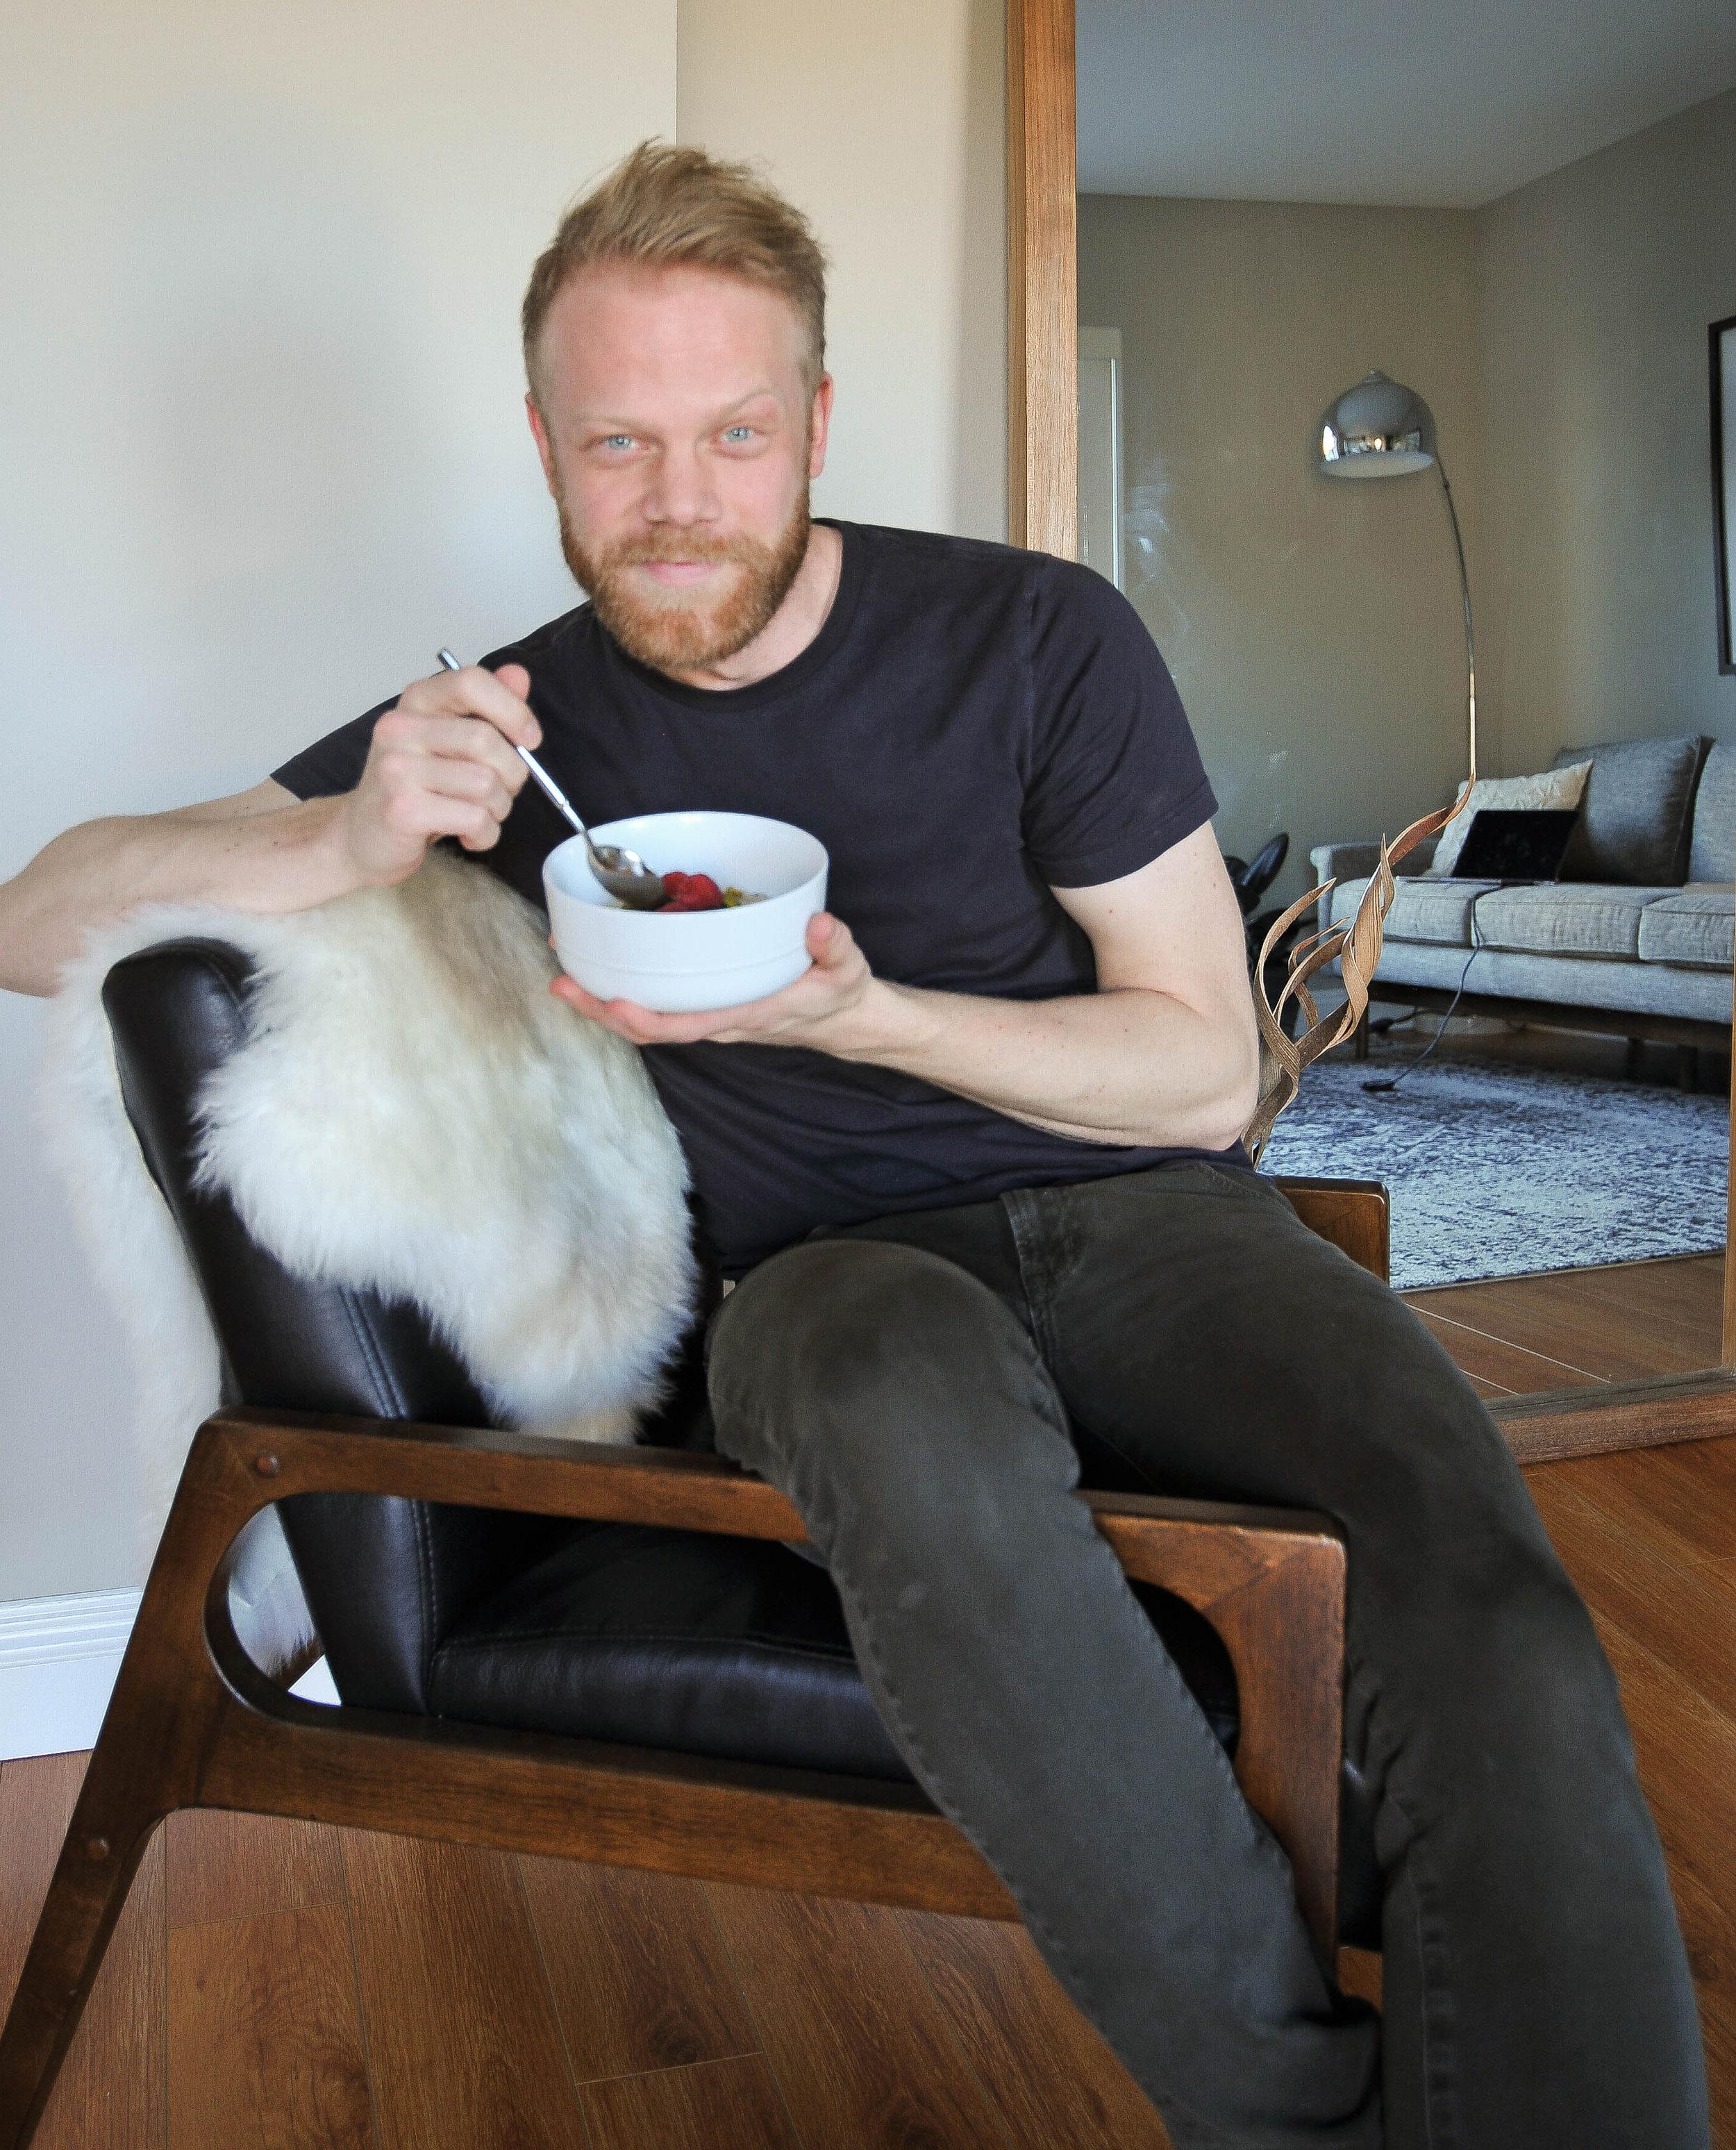 thomassengstrom_Malibu Farm_Quinoa-Oatmeal-Cereal-1.jpg